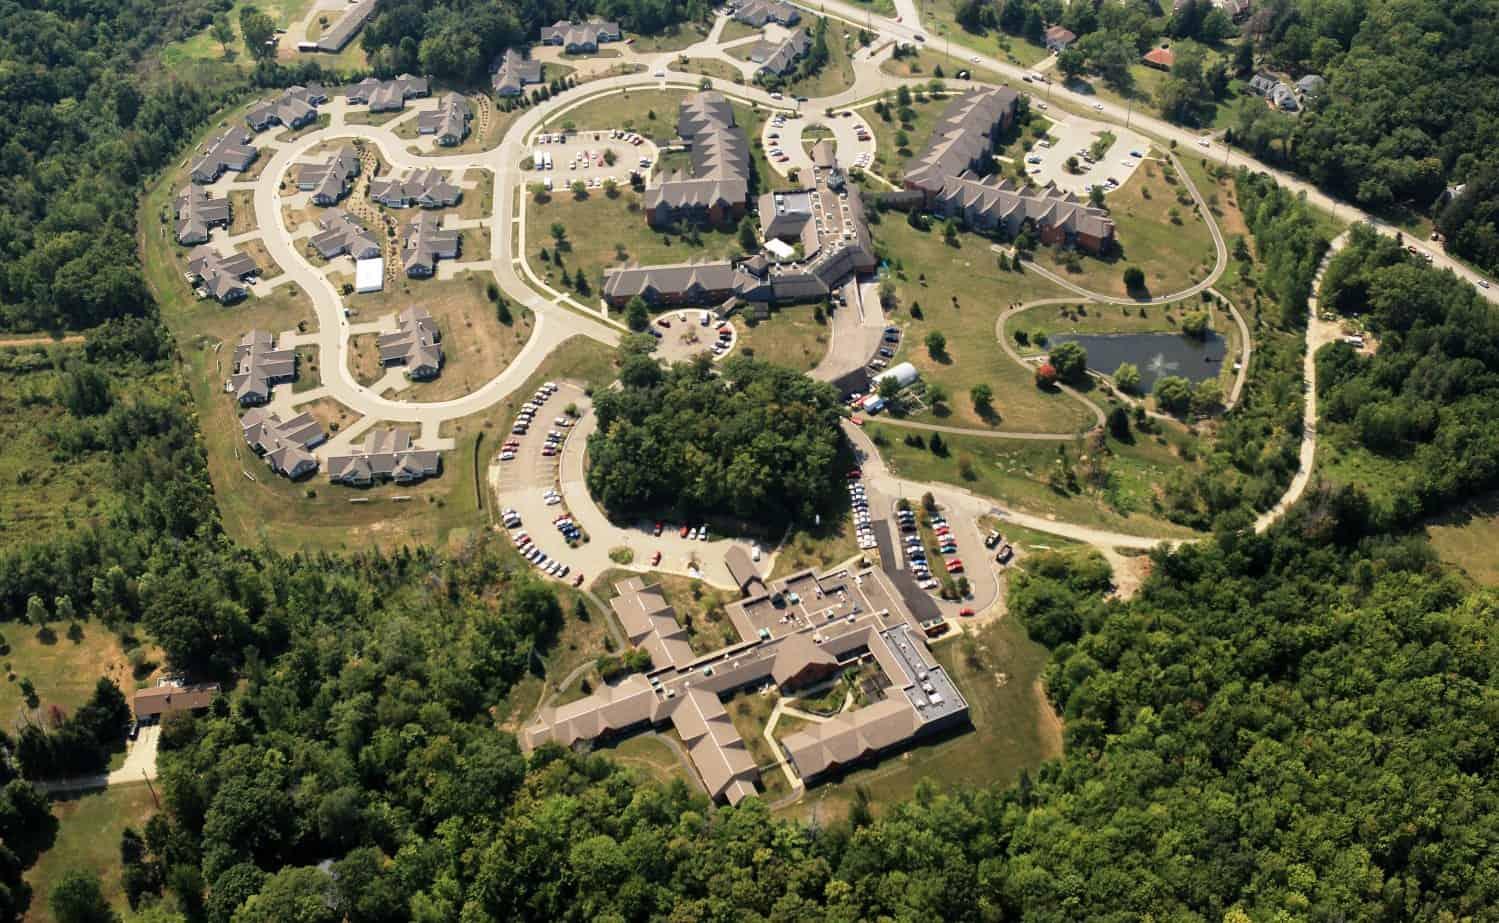 2012 Aerial photos of Springhill campus